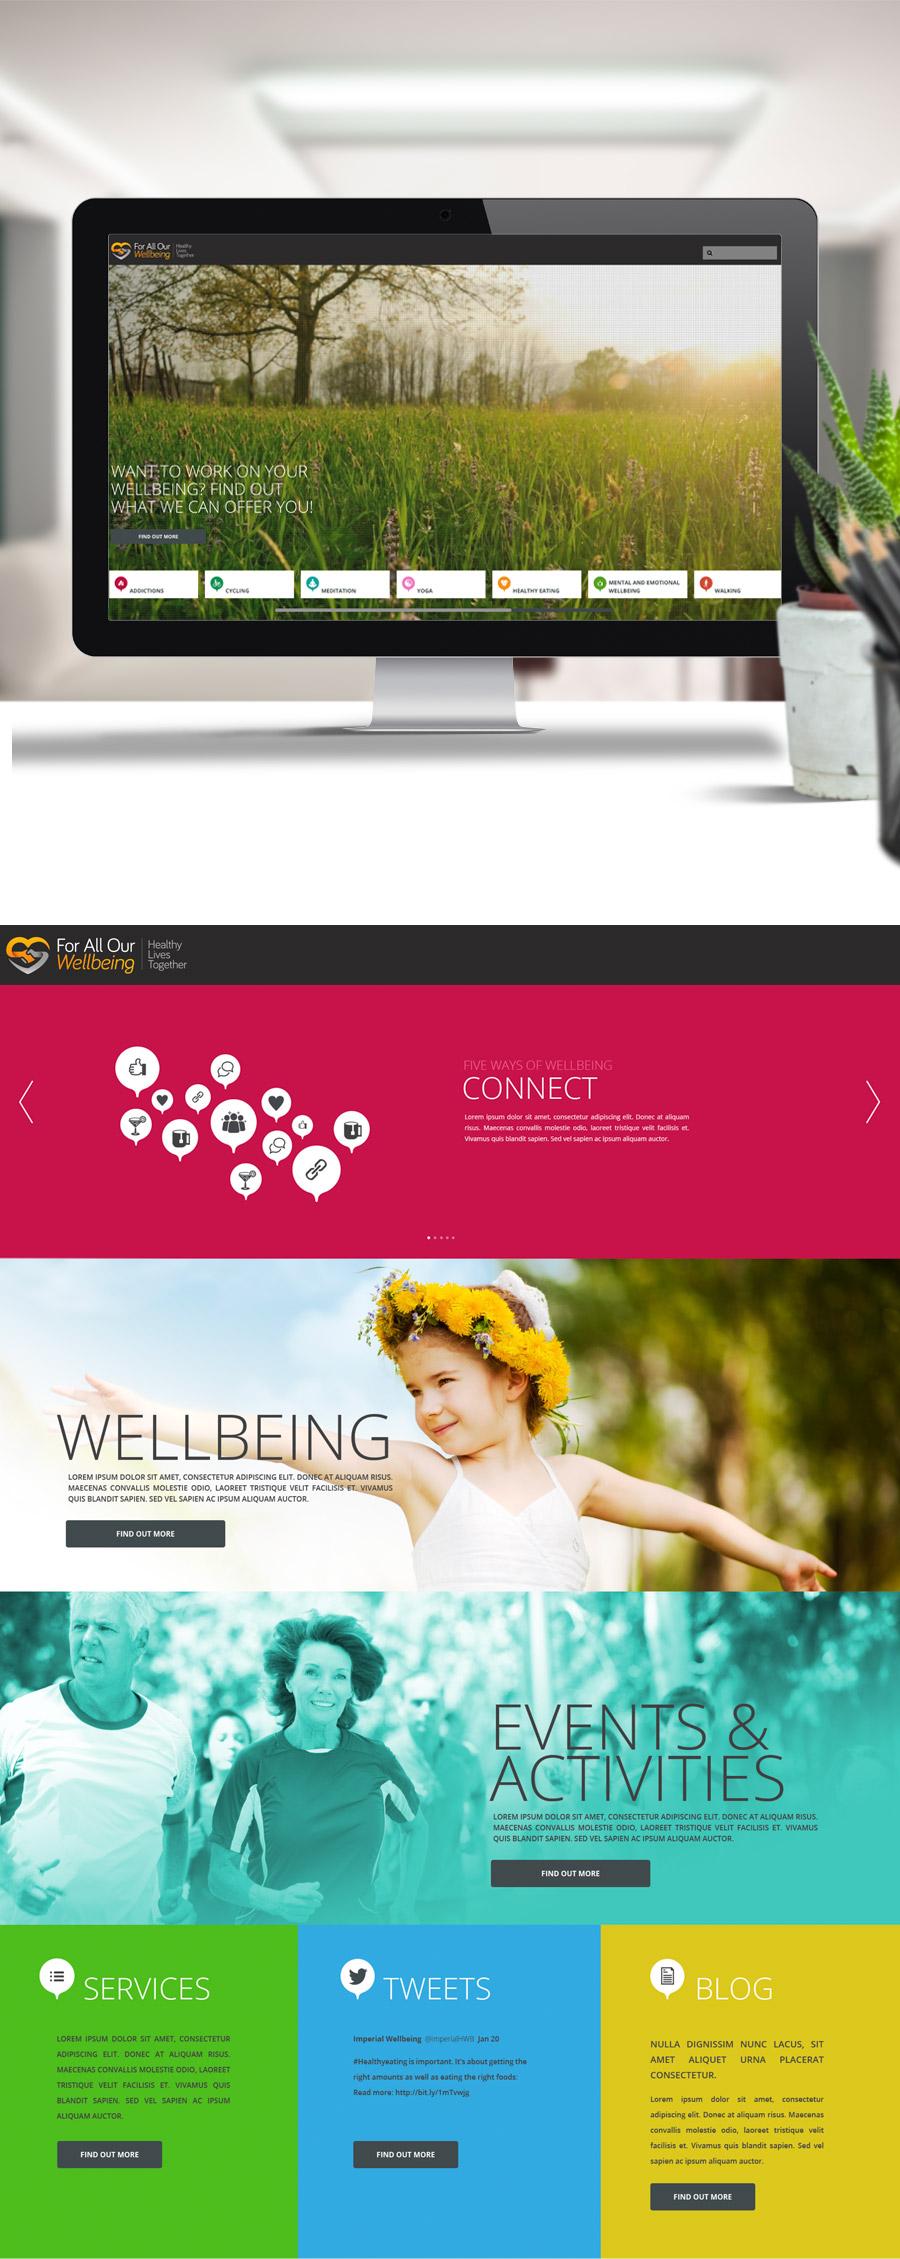 wellbeing-website-01